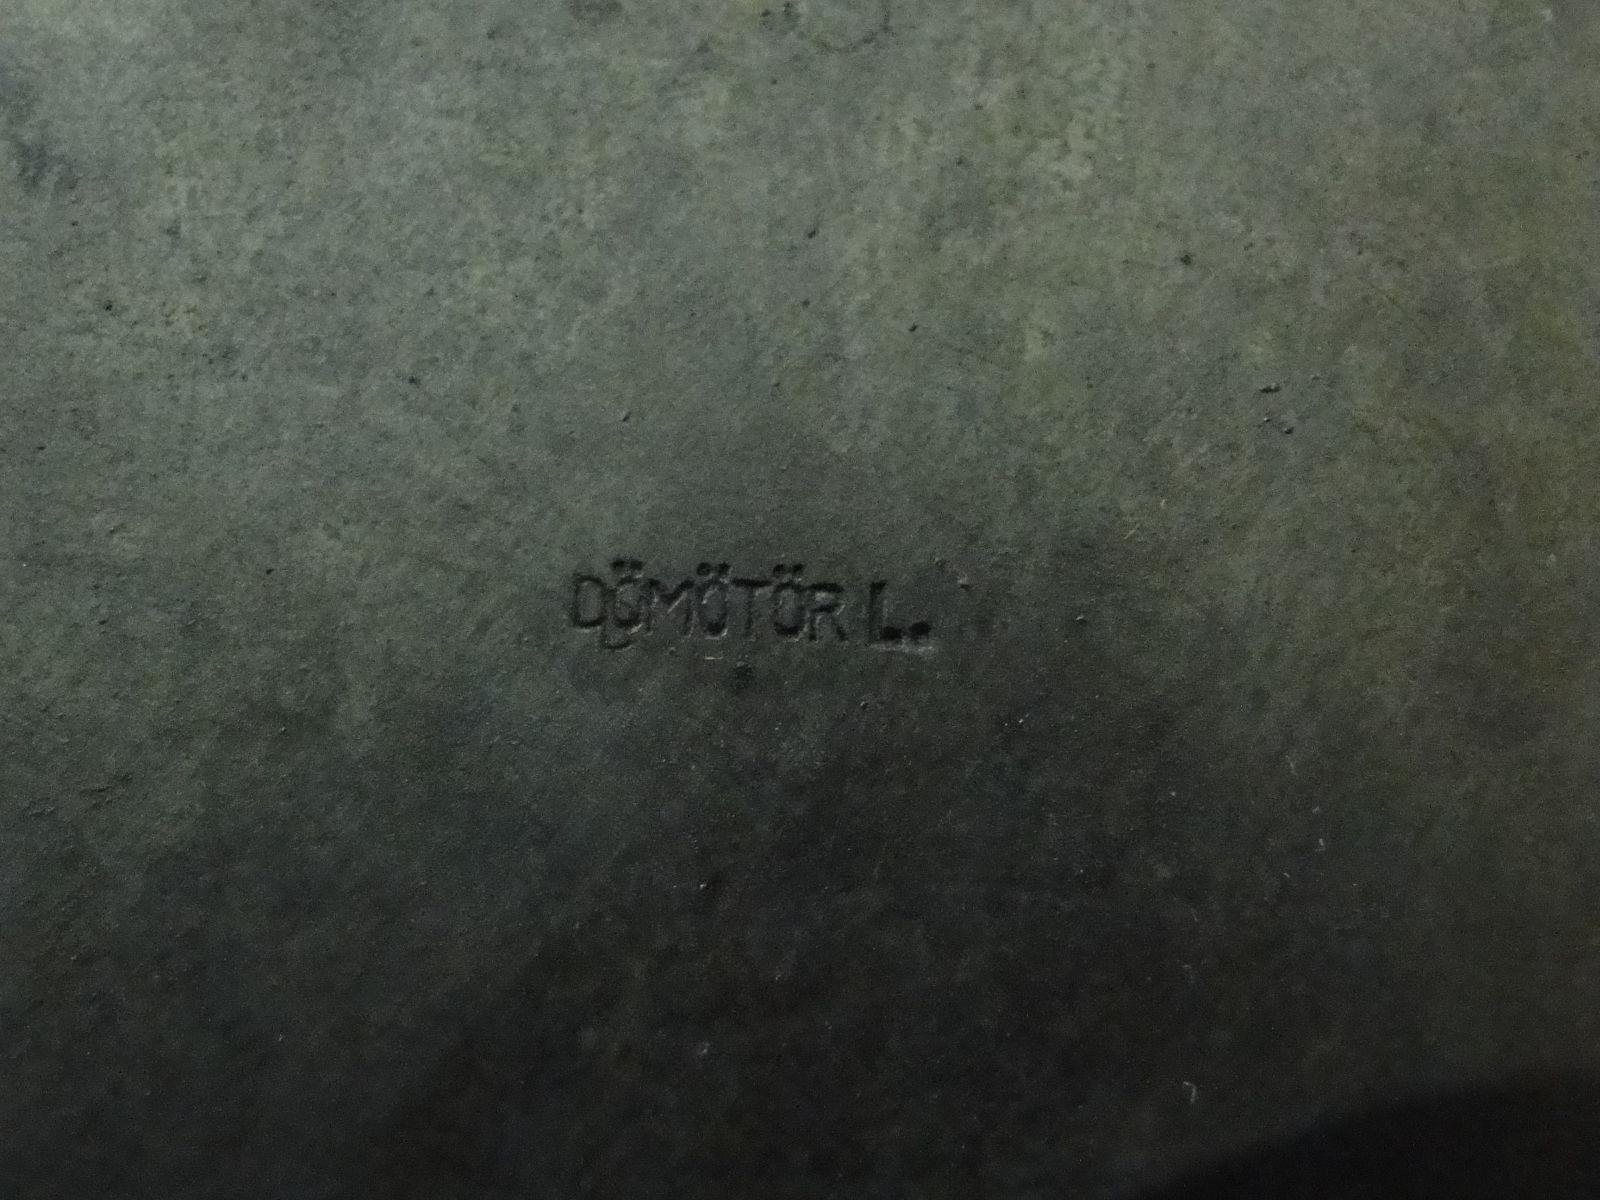 DSC08014.JPG (1600×1200)